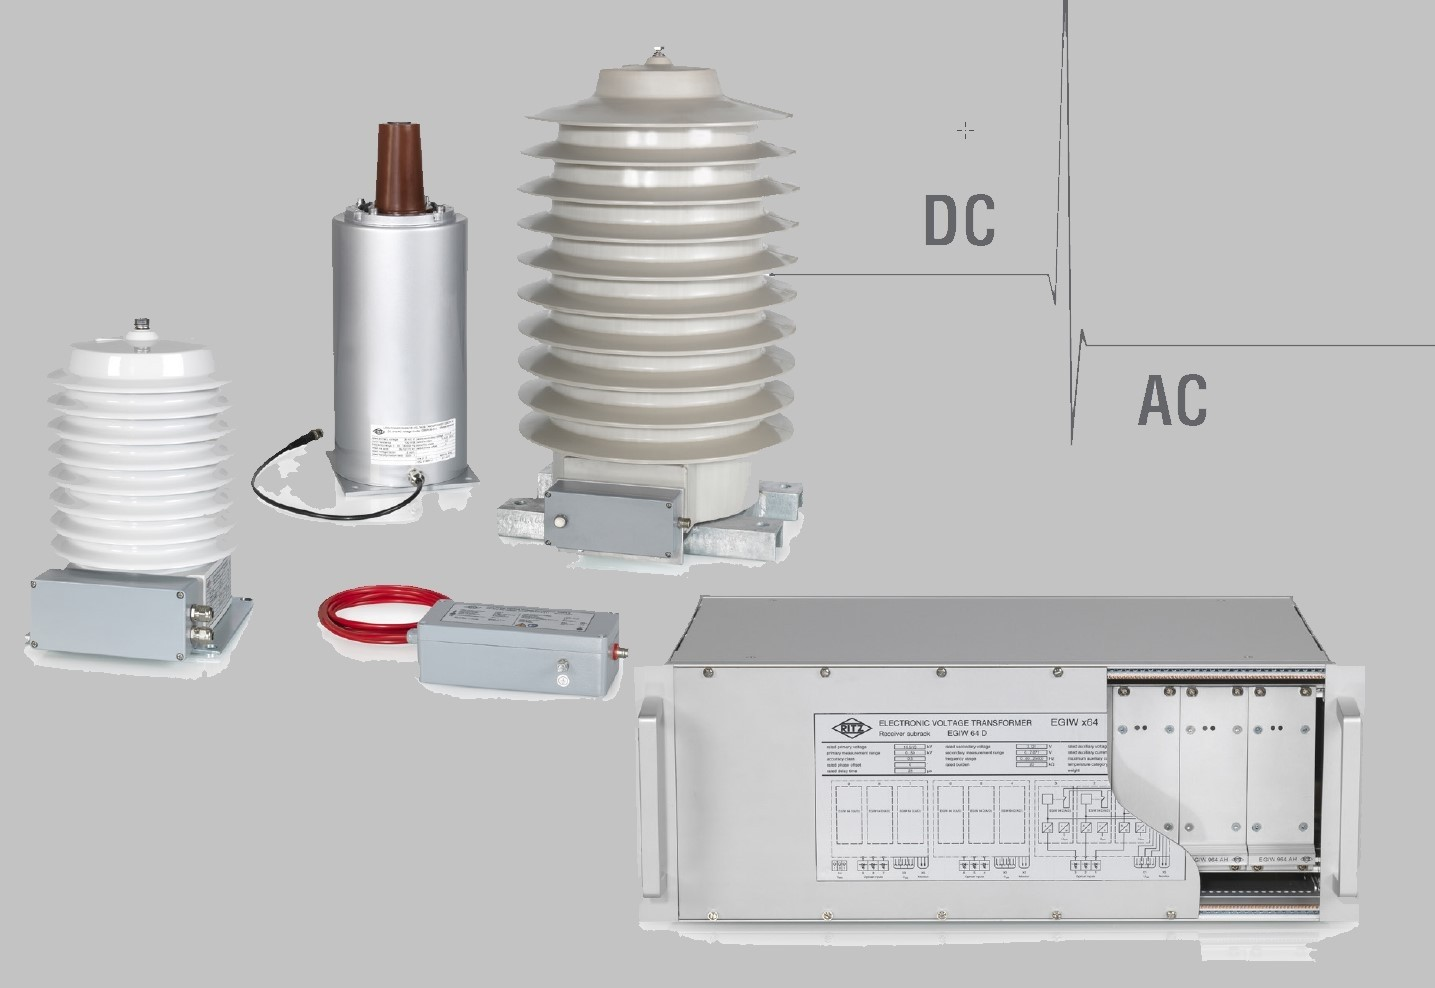 EGIW x64 Electronic Voltage Transformer